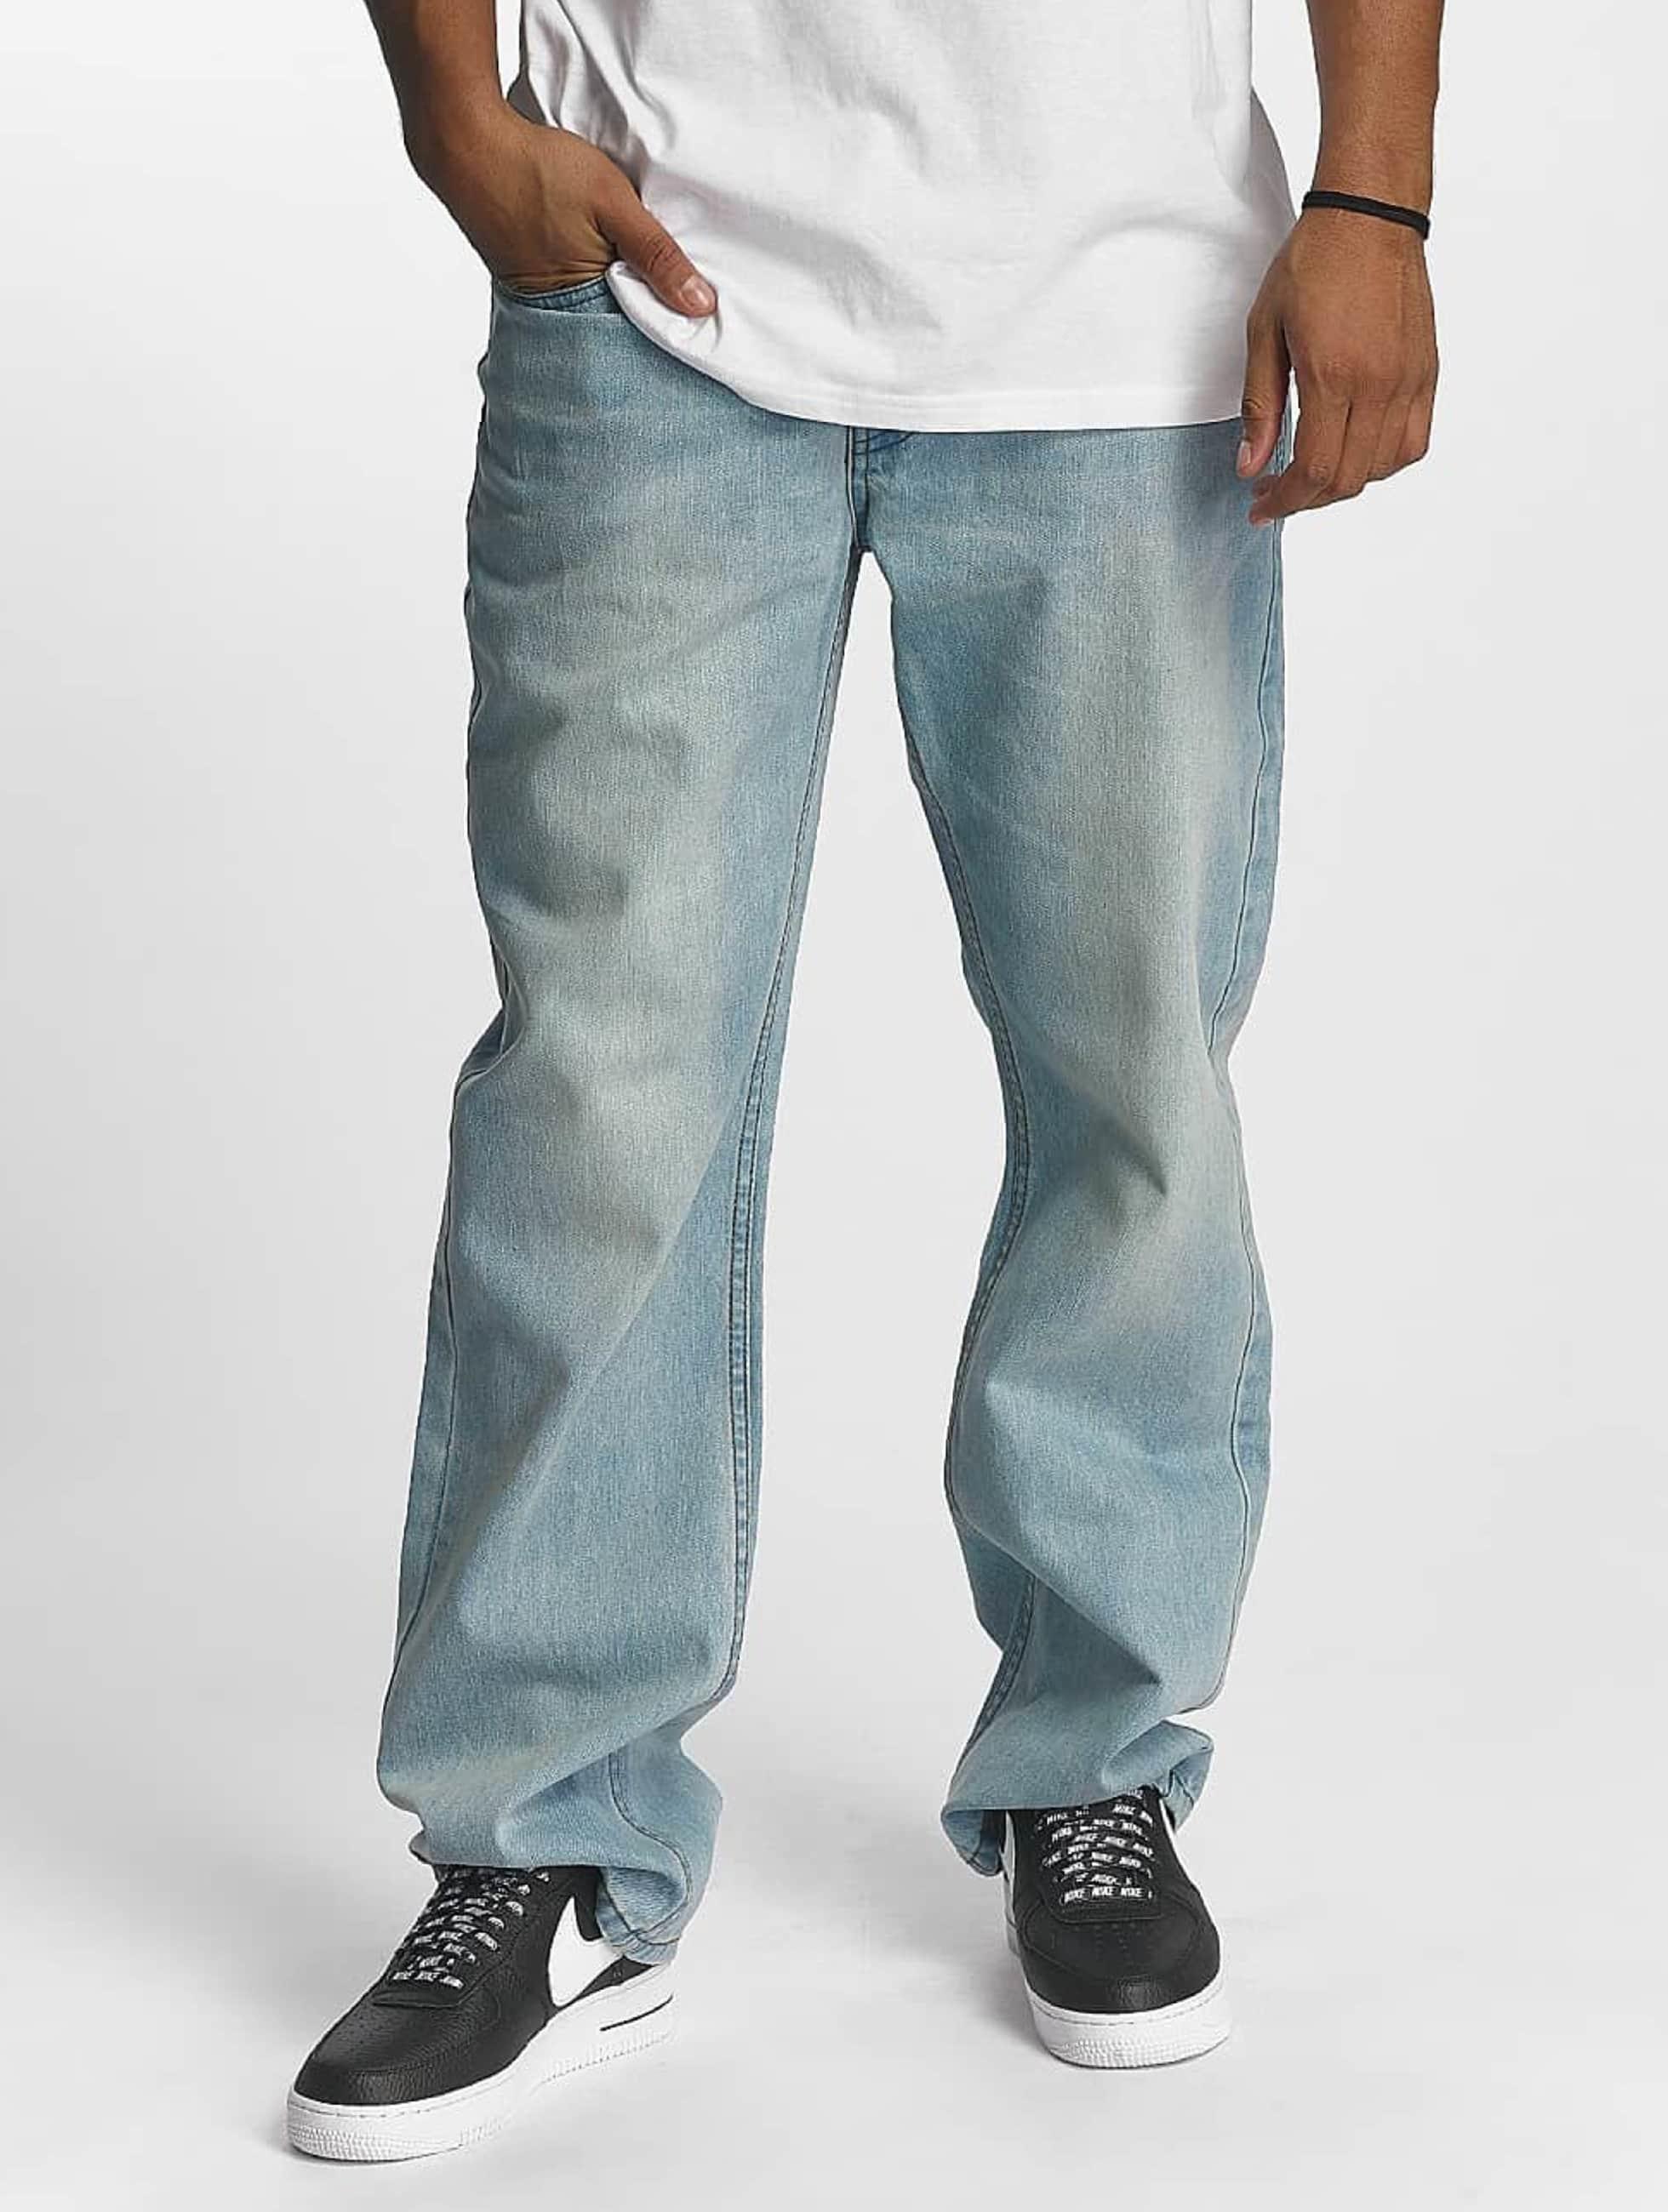 Rocawear / Baggy Baggy Fit in blue W 44